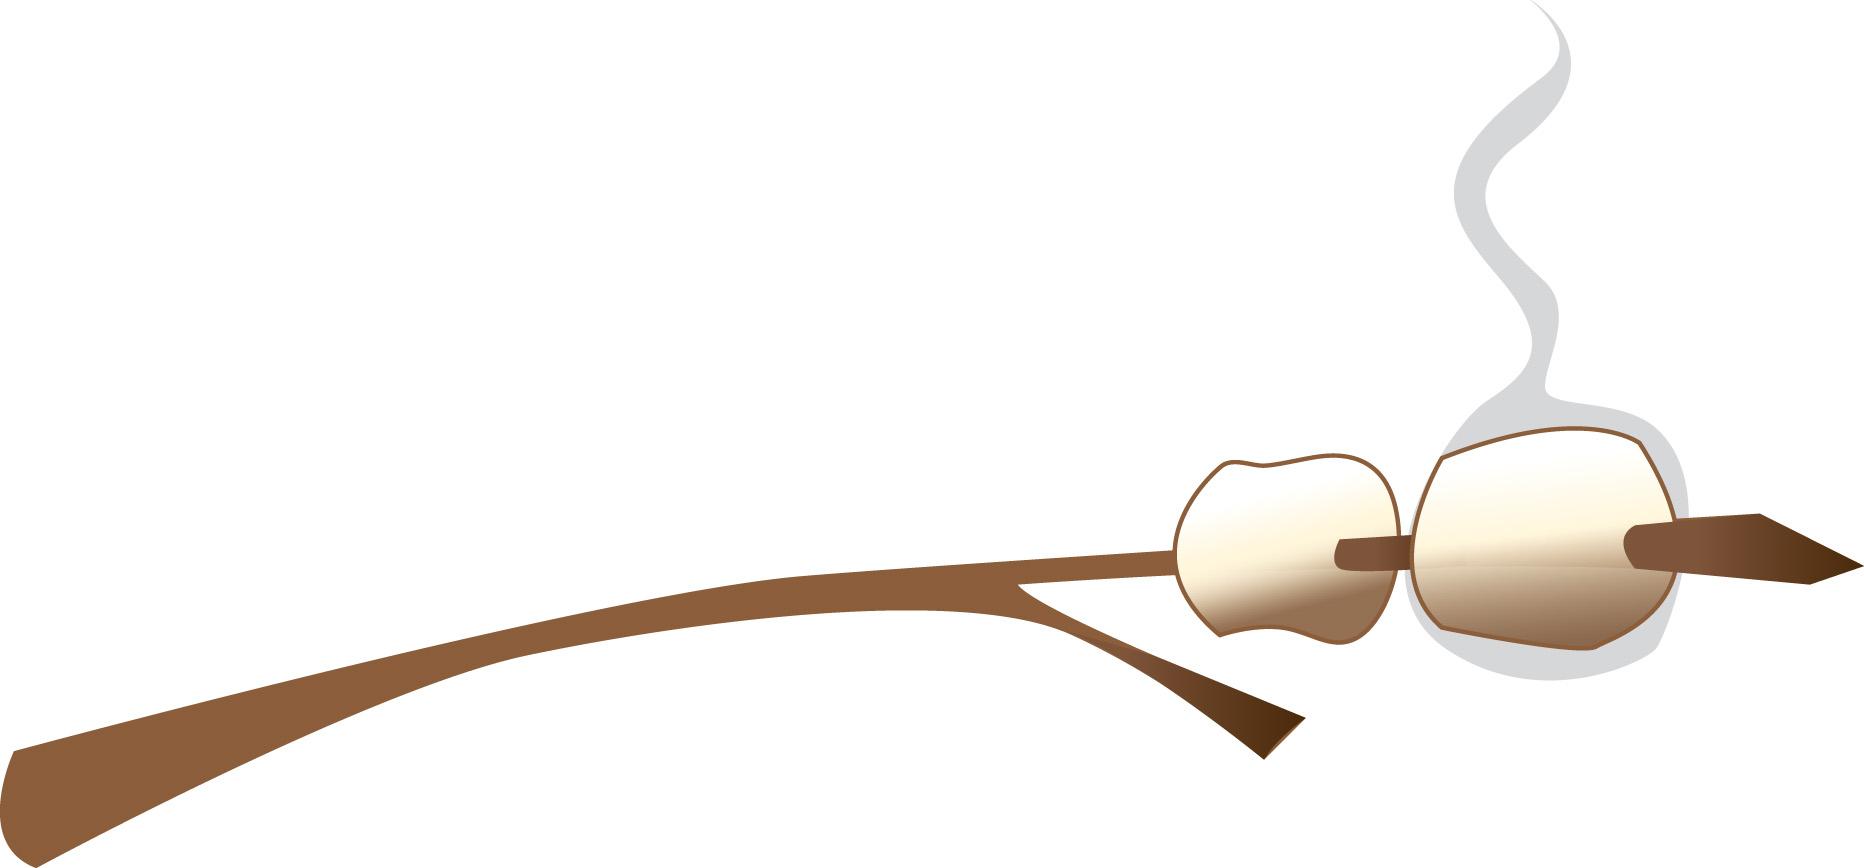 Cartoon Marshmallow Roasting Clipart Fre-Cartoon Marshmallow Roasting Clipart Free Clip Art Images-18